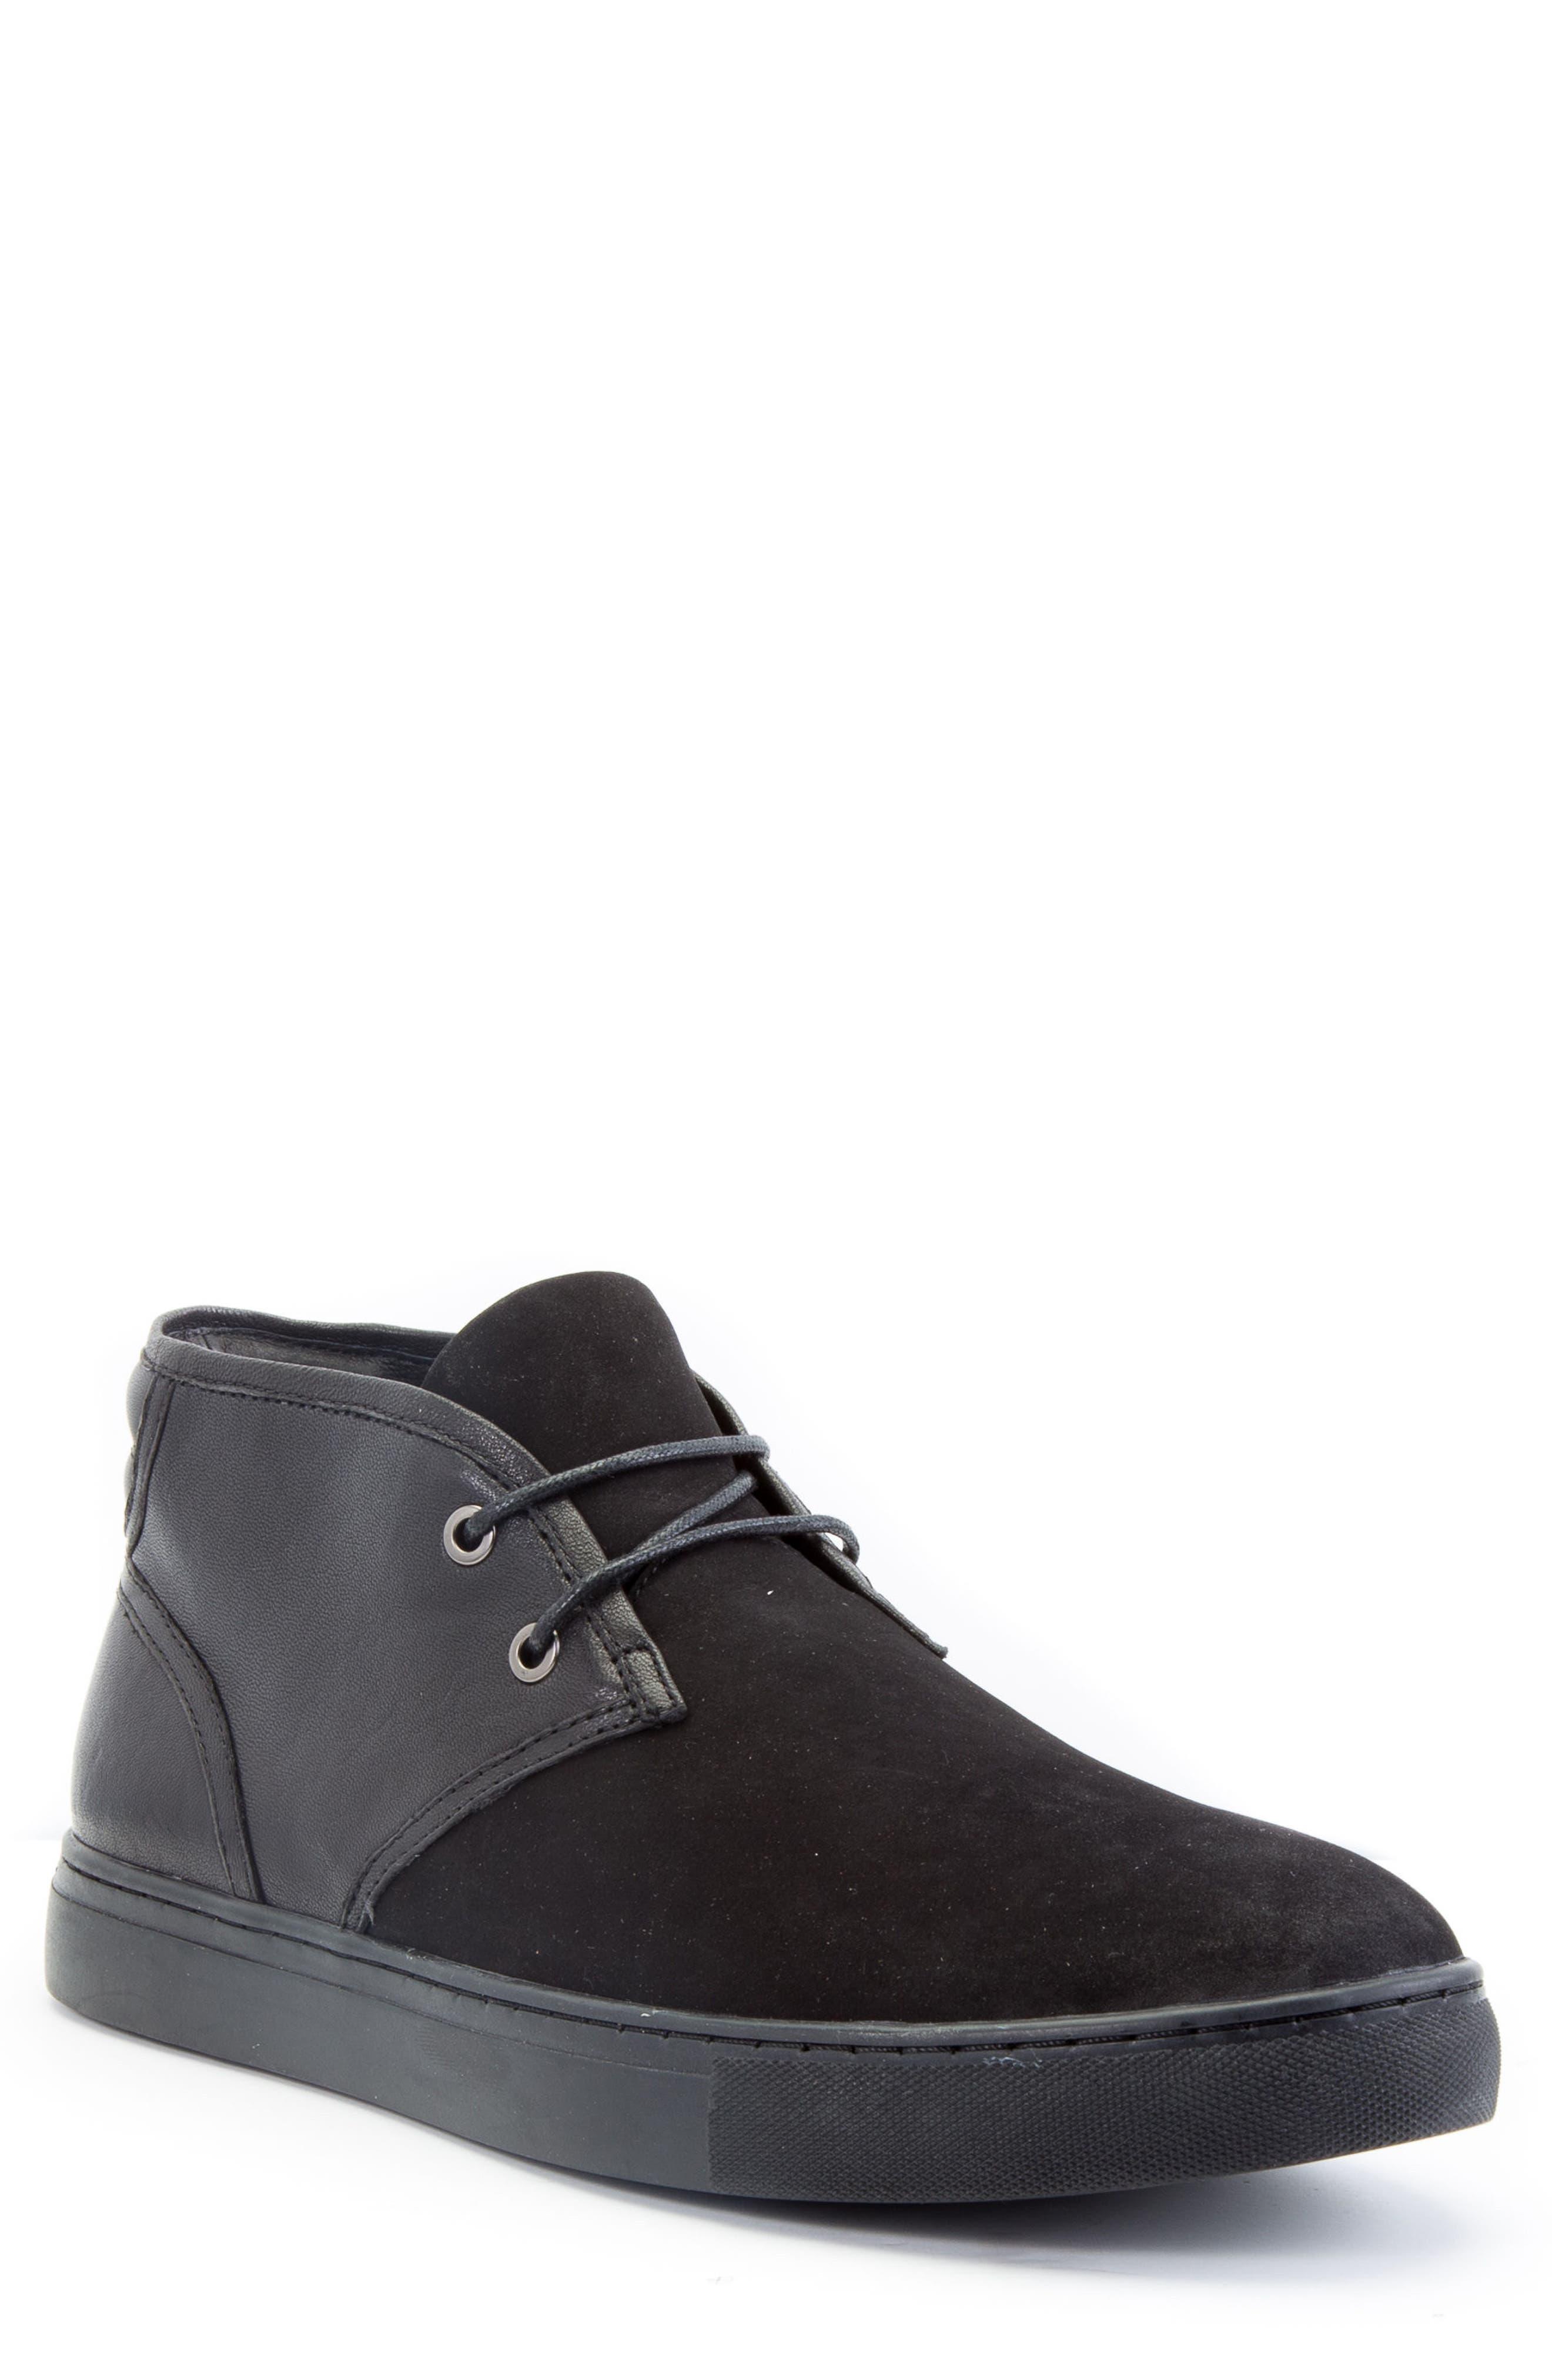 Catlett Chukka Sneaker,                             Main thumbnail 1, color,                             001